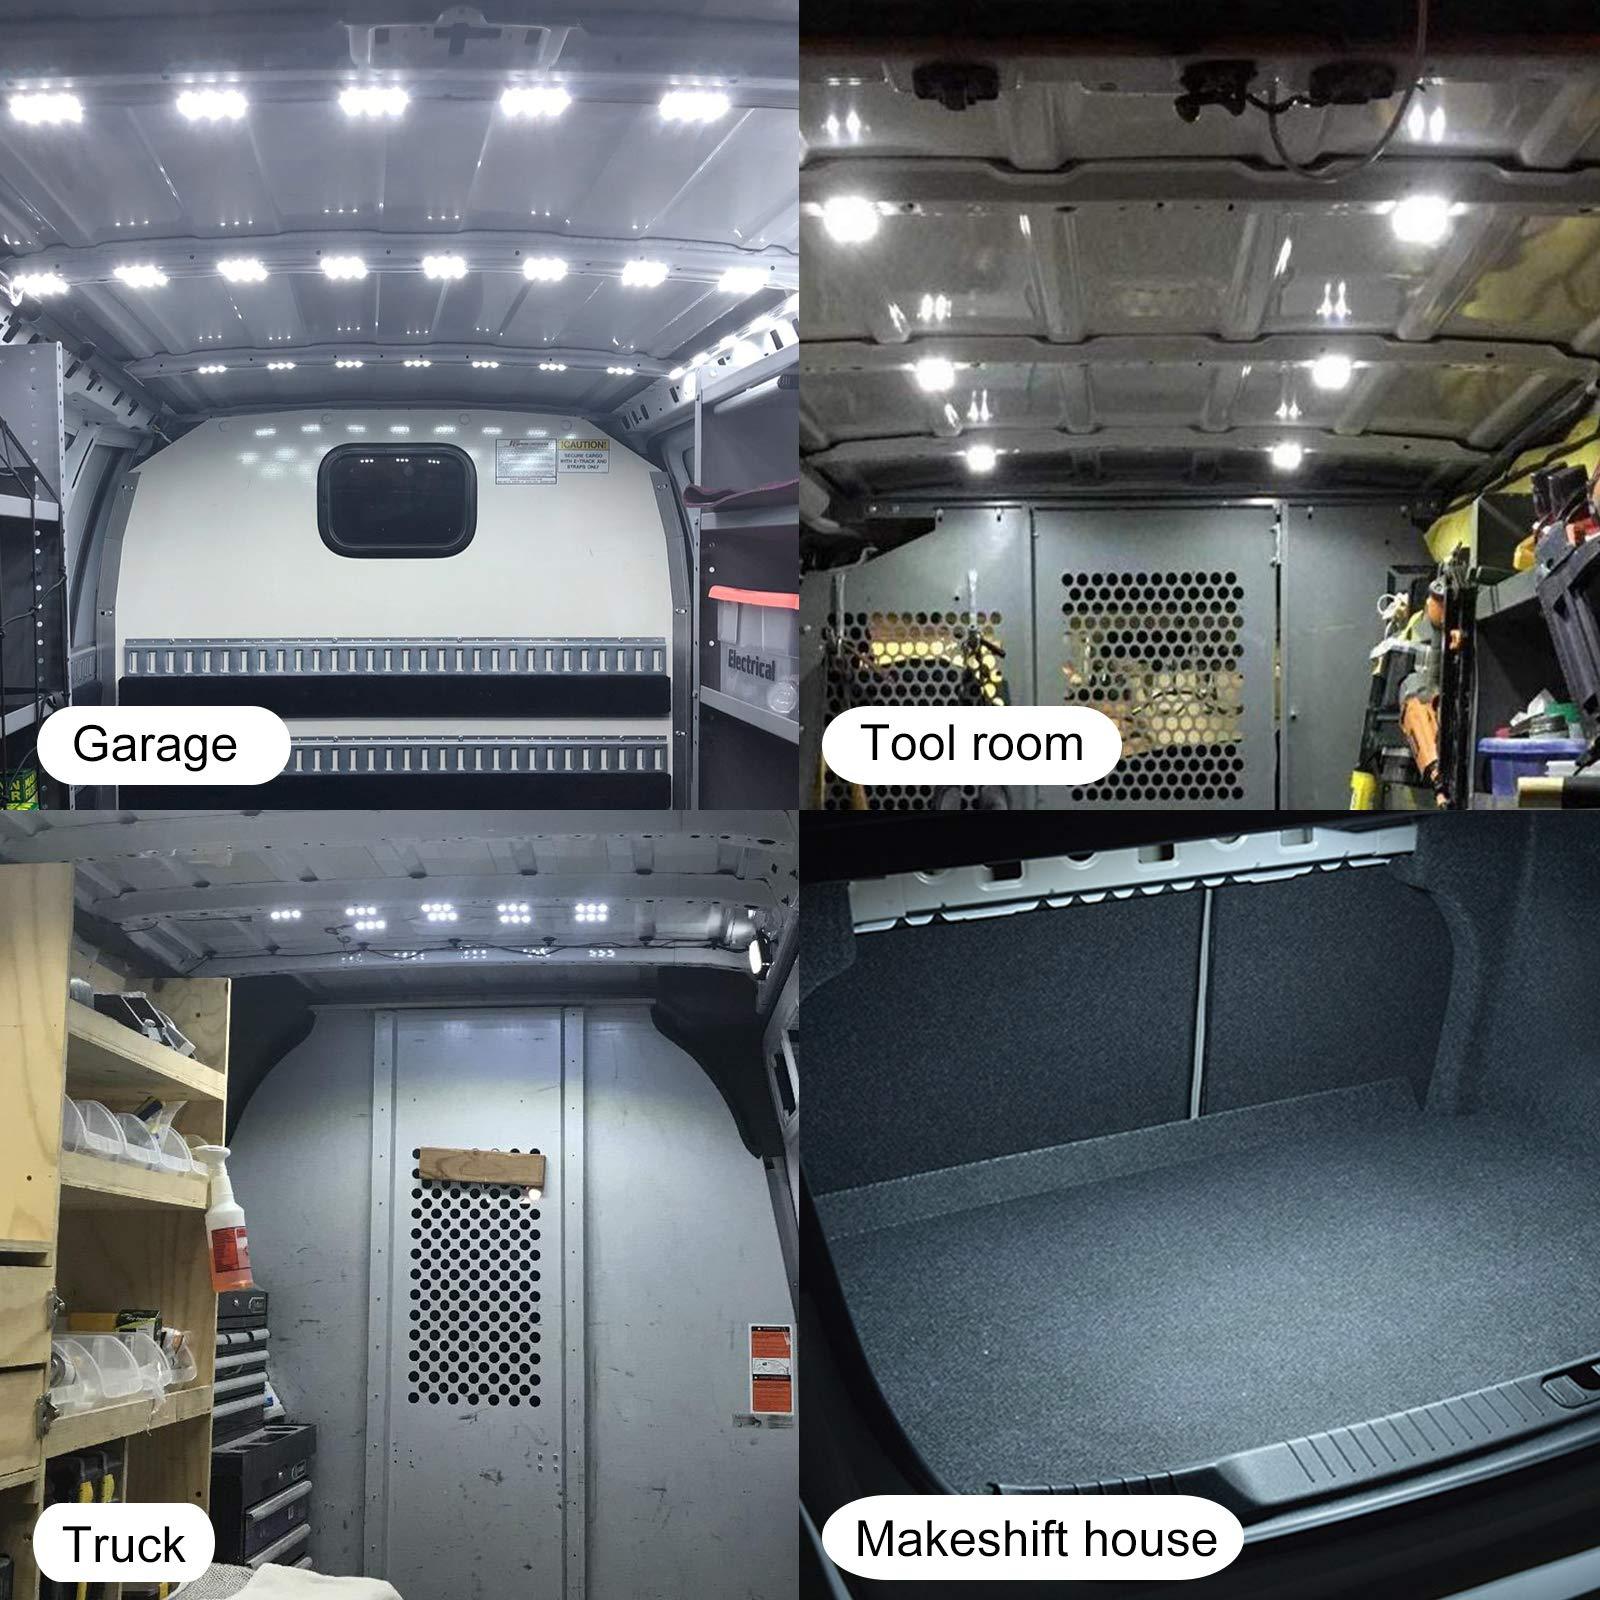 ROYFACC 60 LED Car Interior Light Bright White Lighting Dome Lamp Ceiling Work Lights Kit for Van Truck Auto Car Vehicle Caravan DC 12V